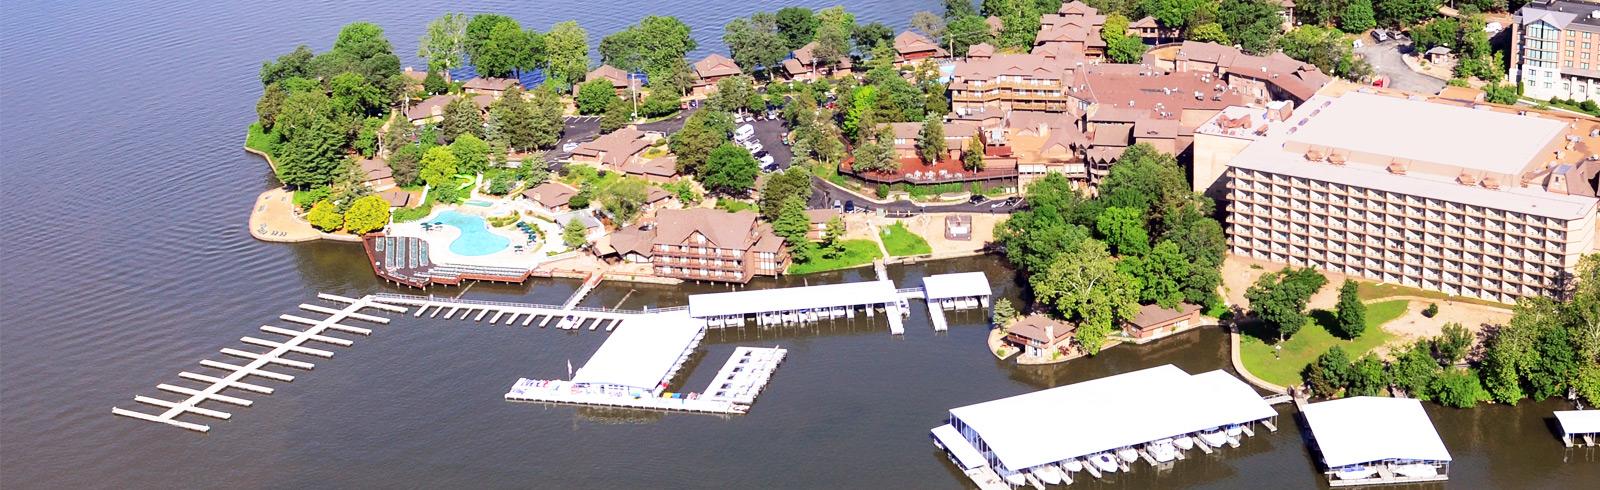 Margaritaville Lake Resort Lake of the Ozarks at Osage Beach, Missouri